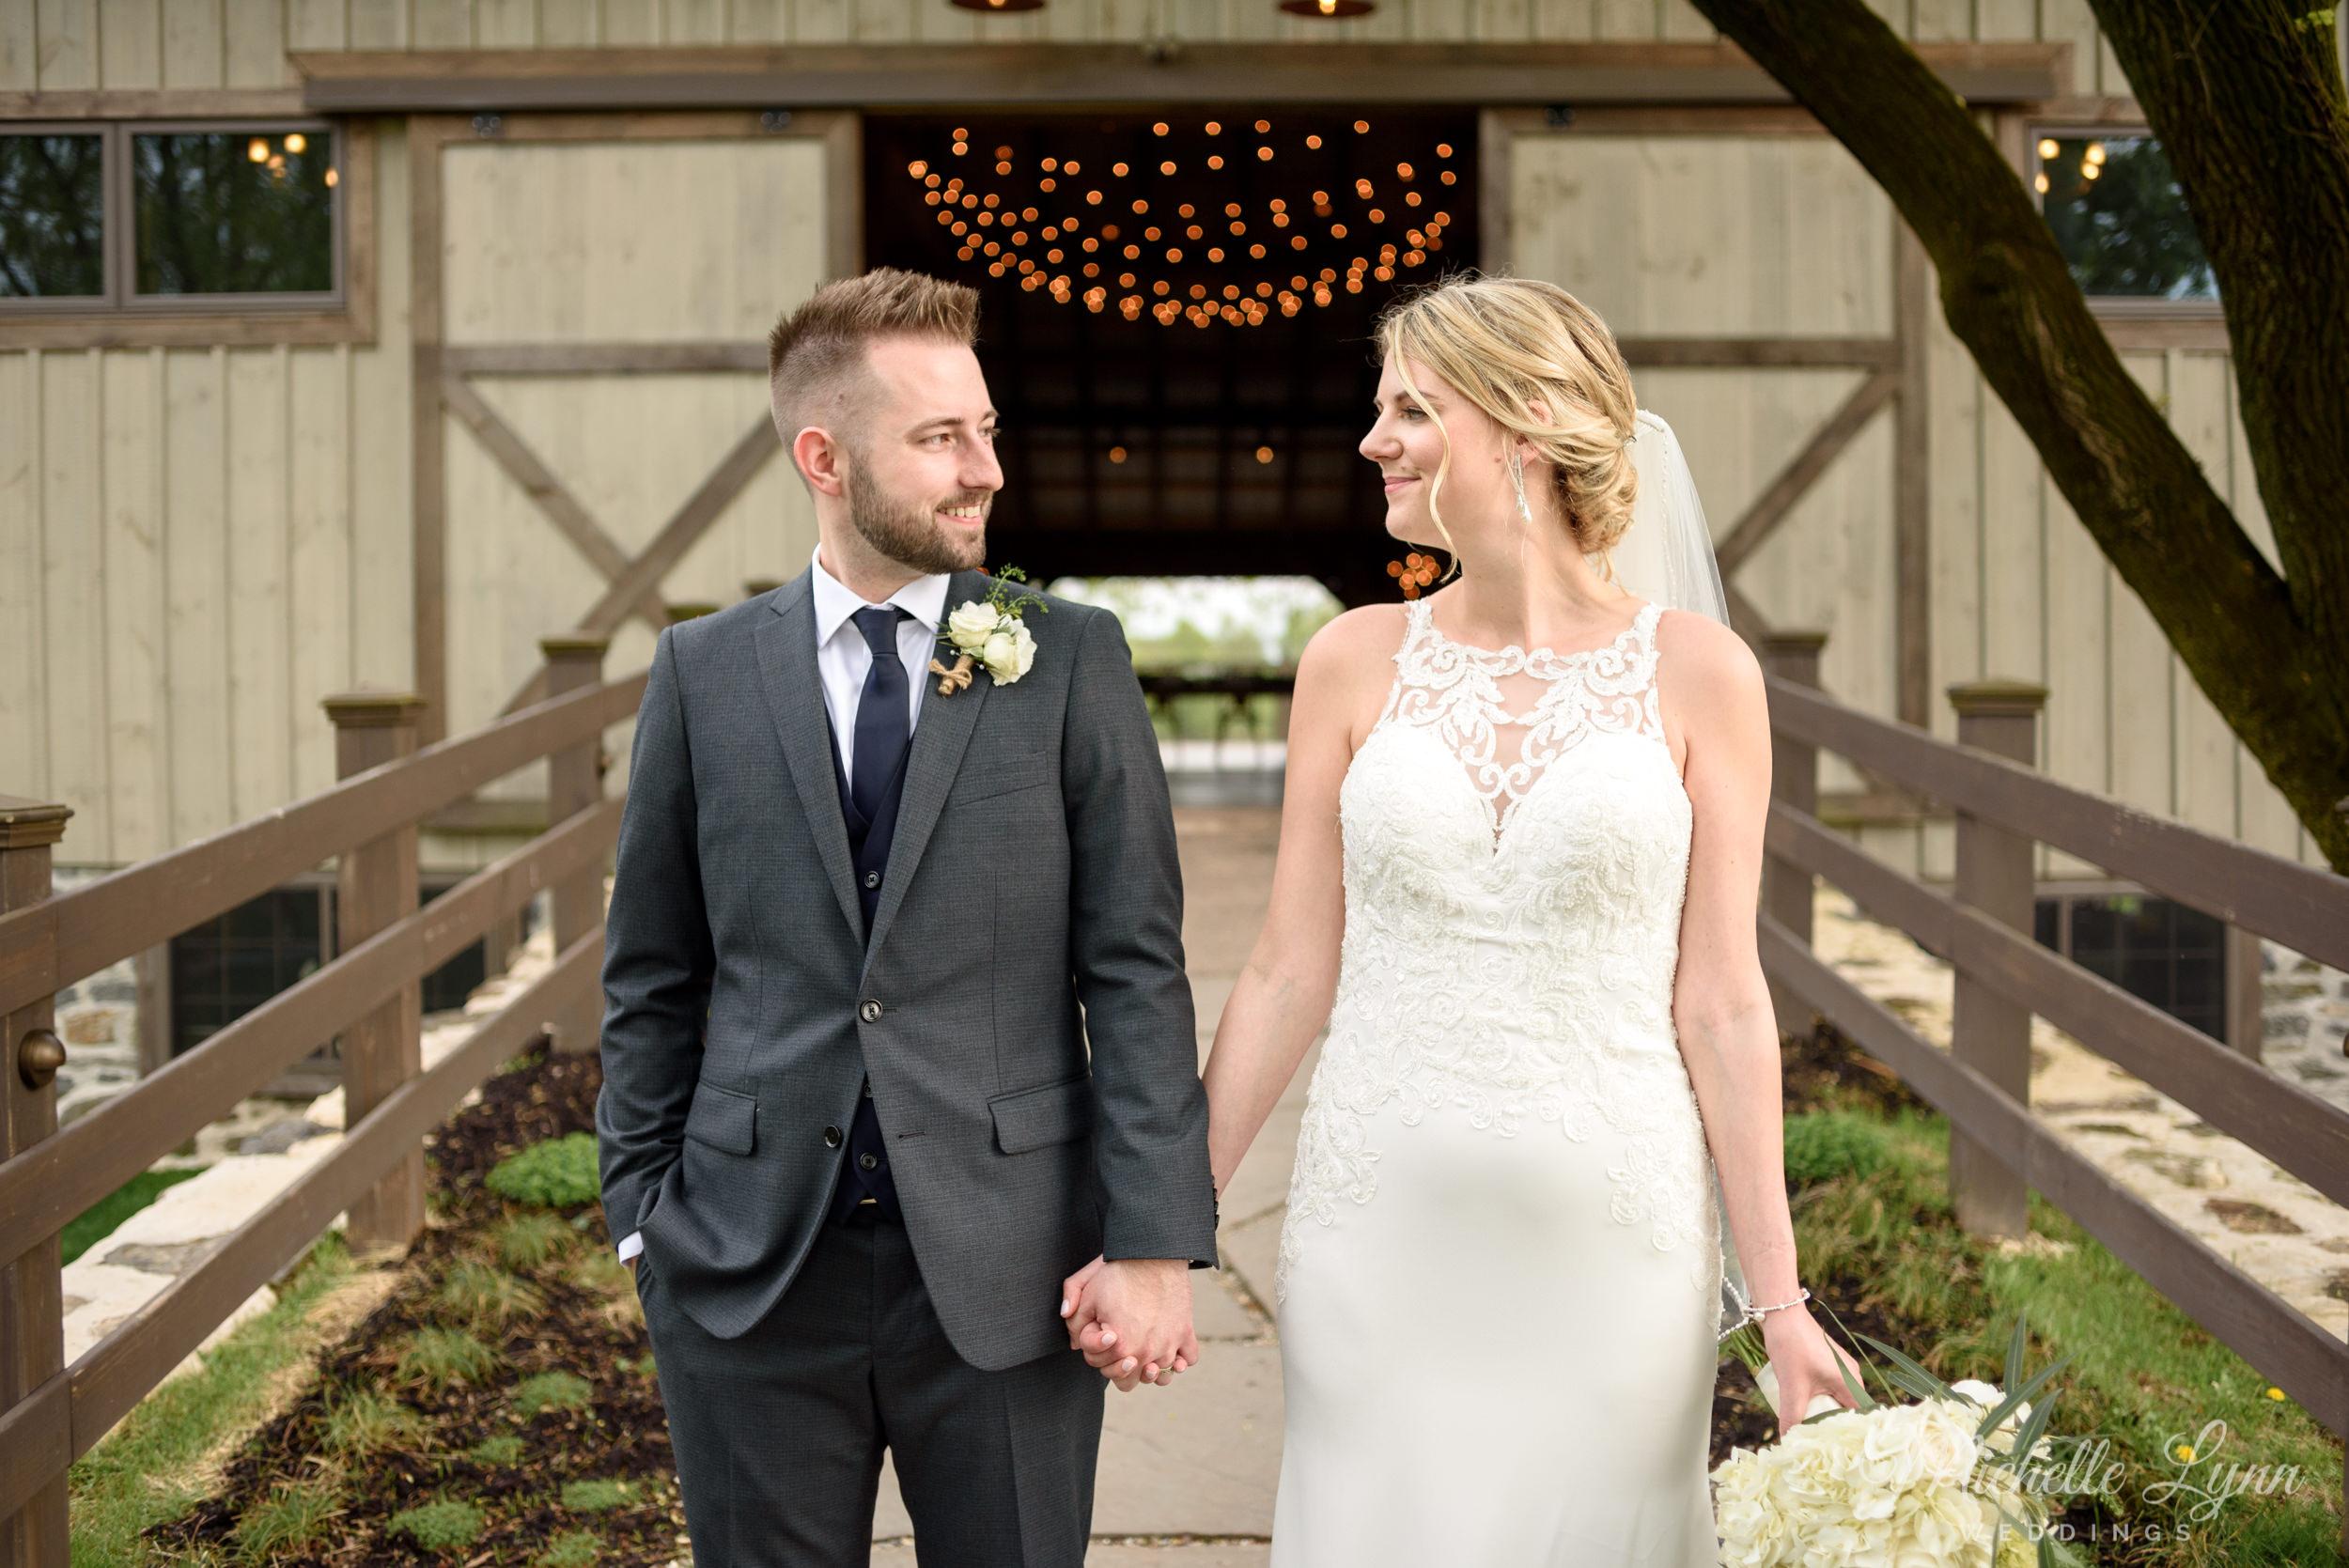 mlw-the-farm-bakery-and-events-wedding-photos-55.jpg